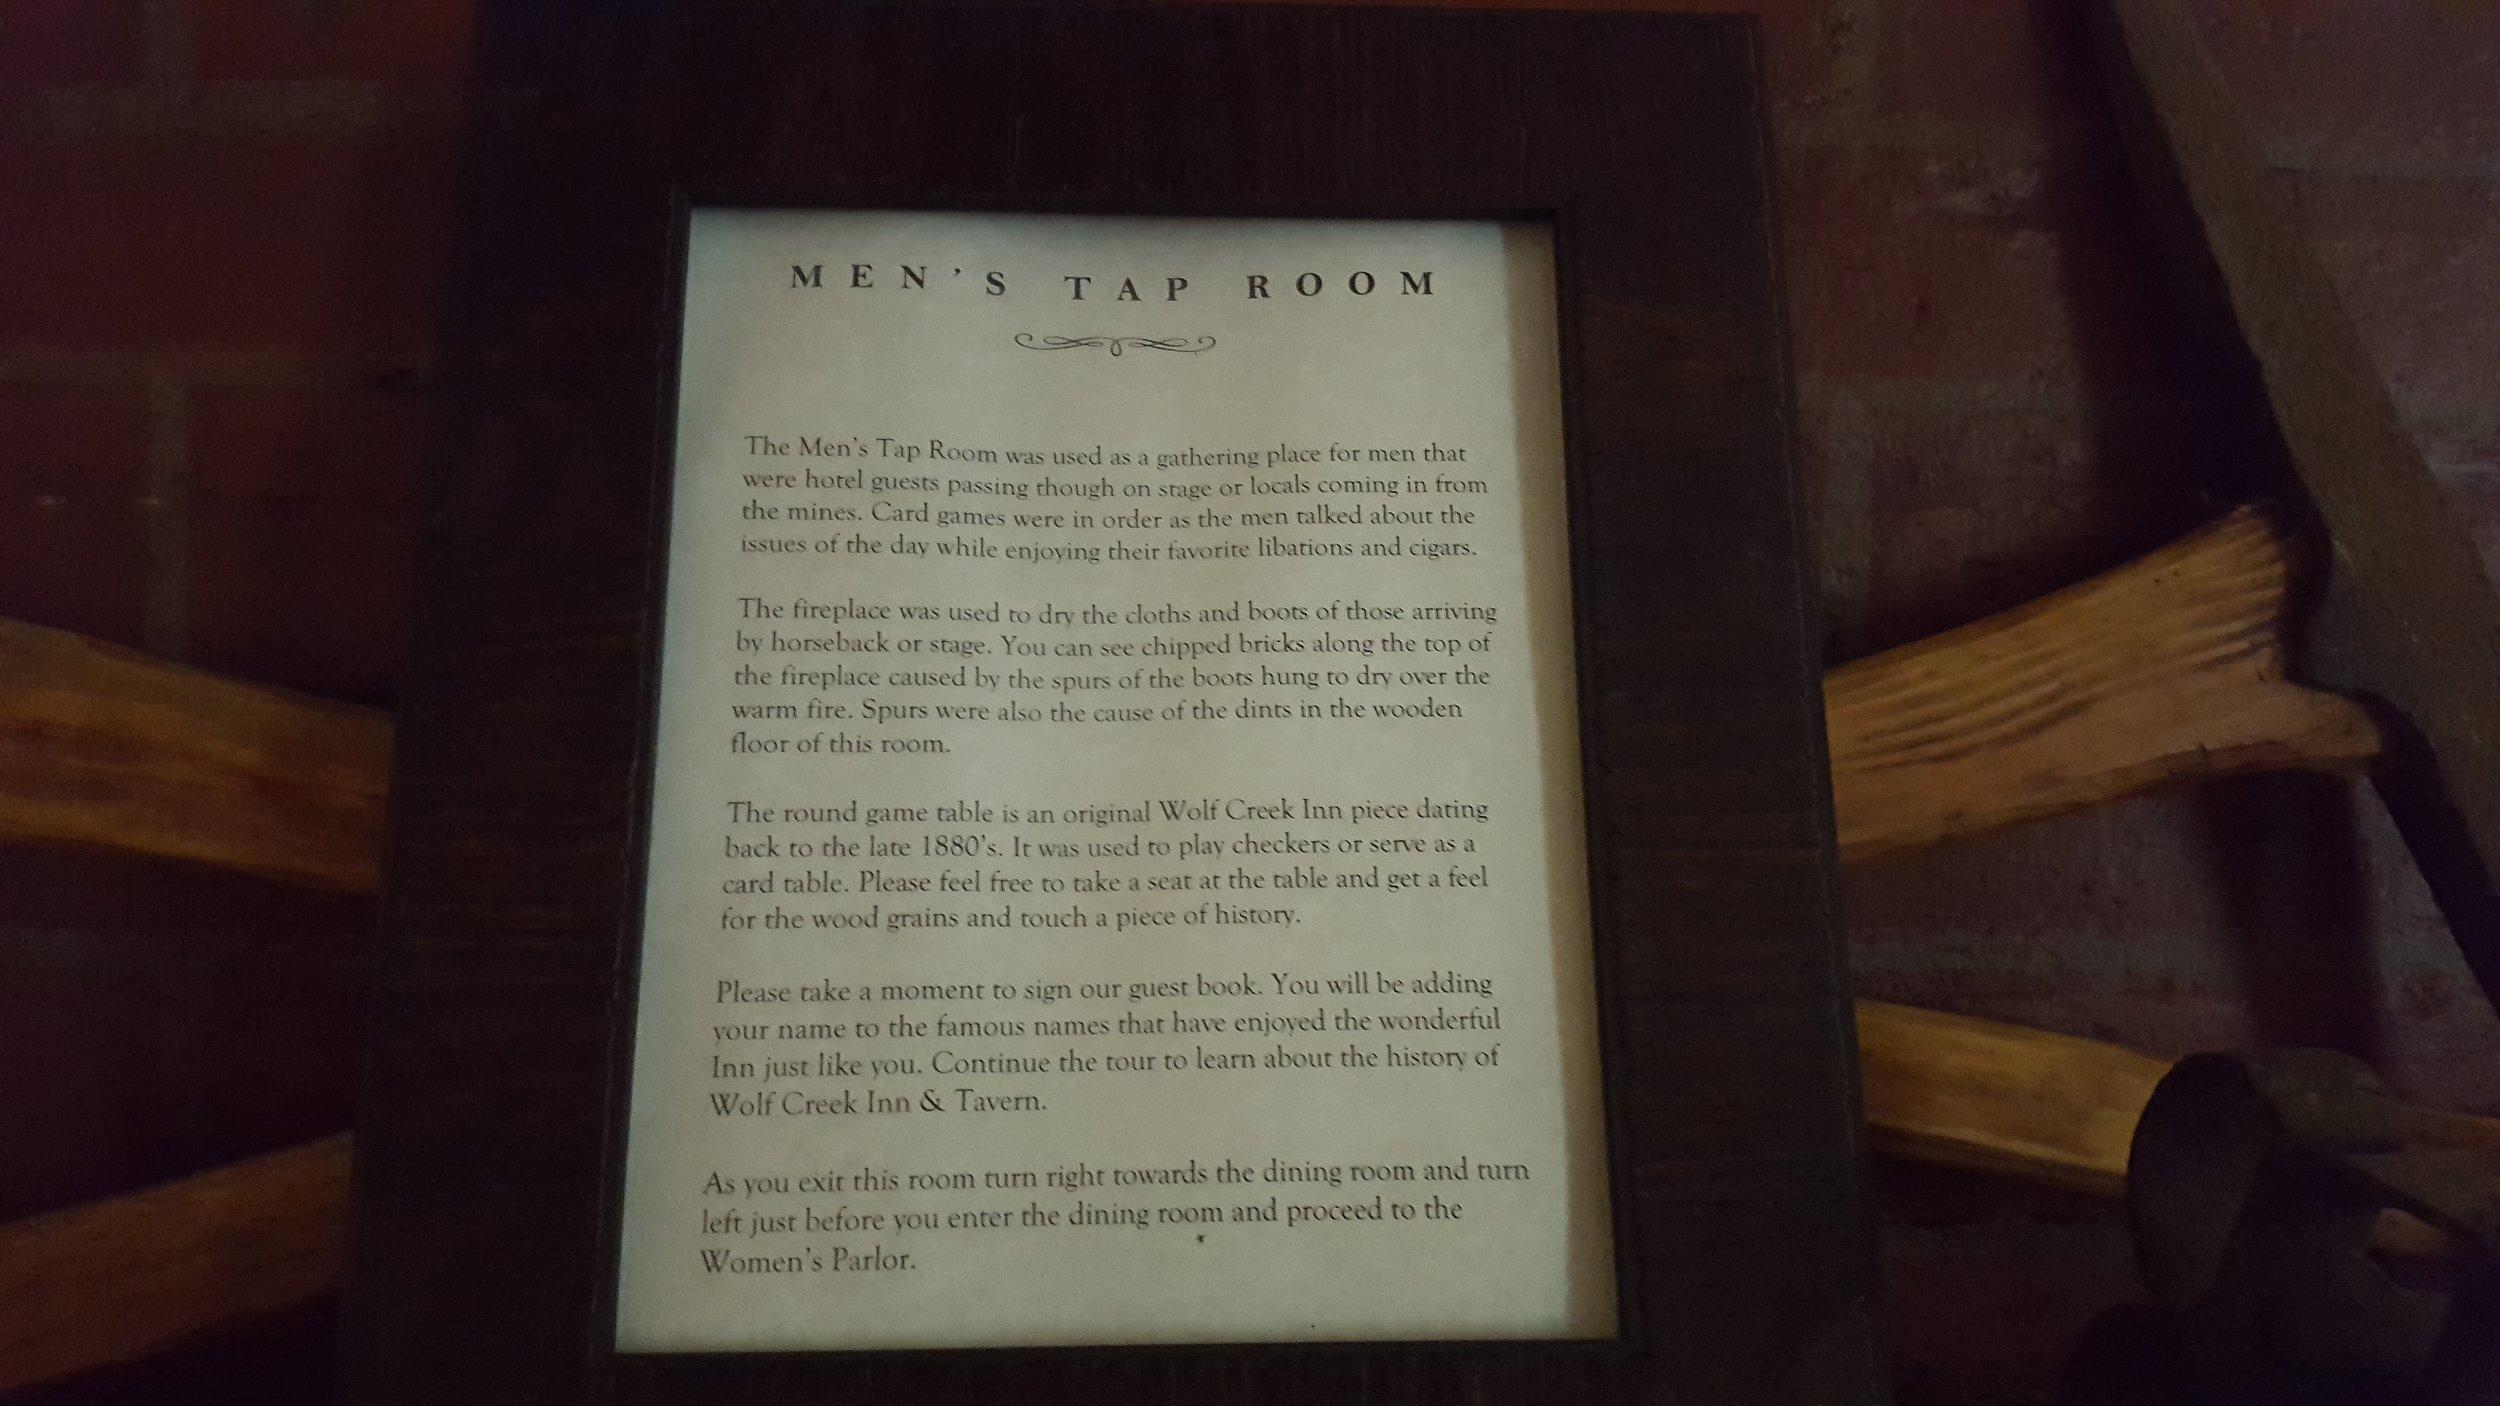 Men's tap room at the Wolf Creek Inn